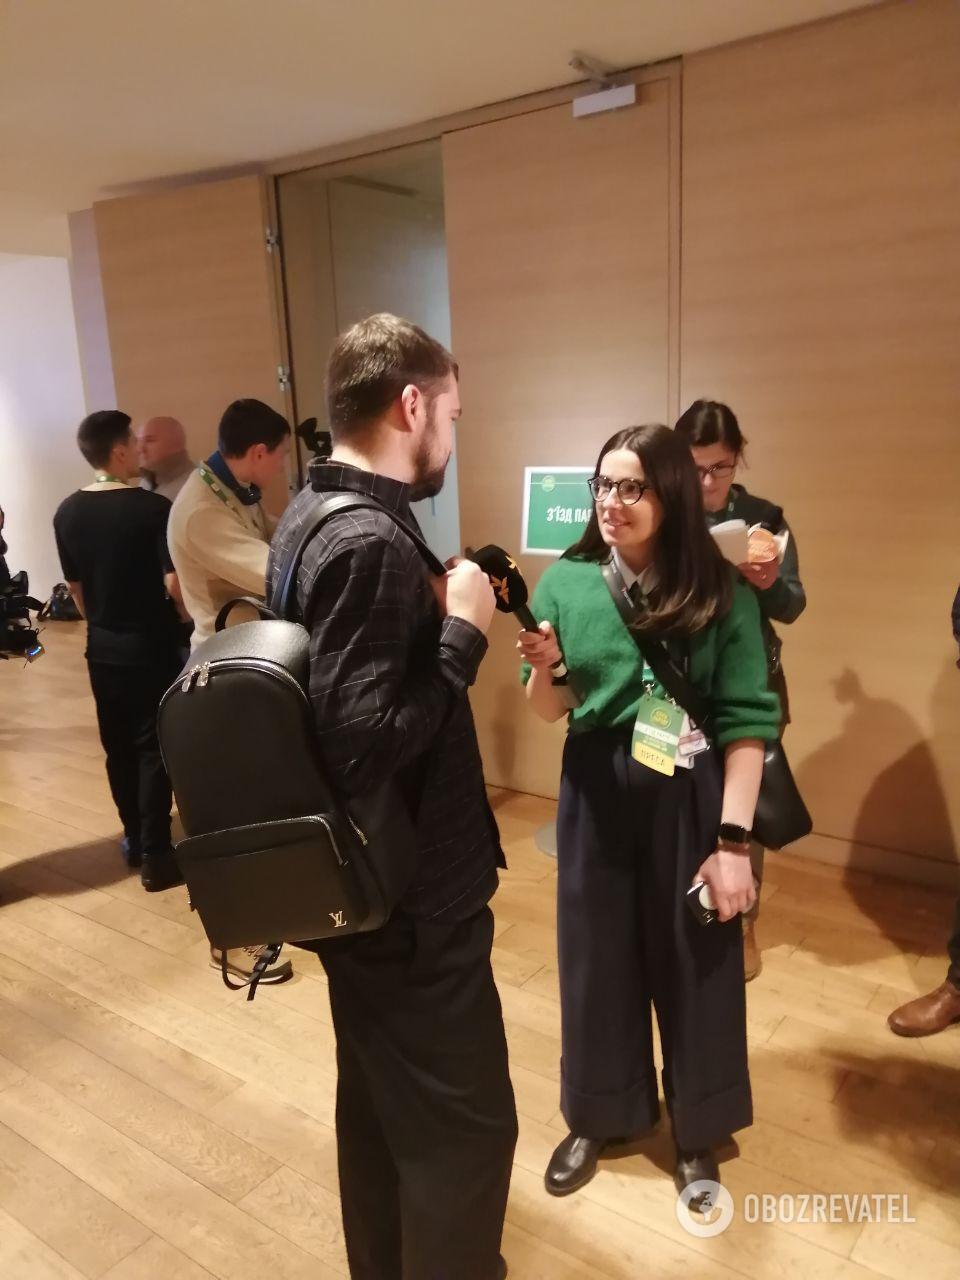 Сергея Трофимова засняли с рюкзаком Louis Vuitton